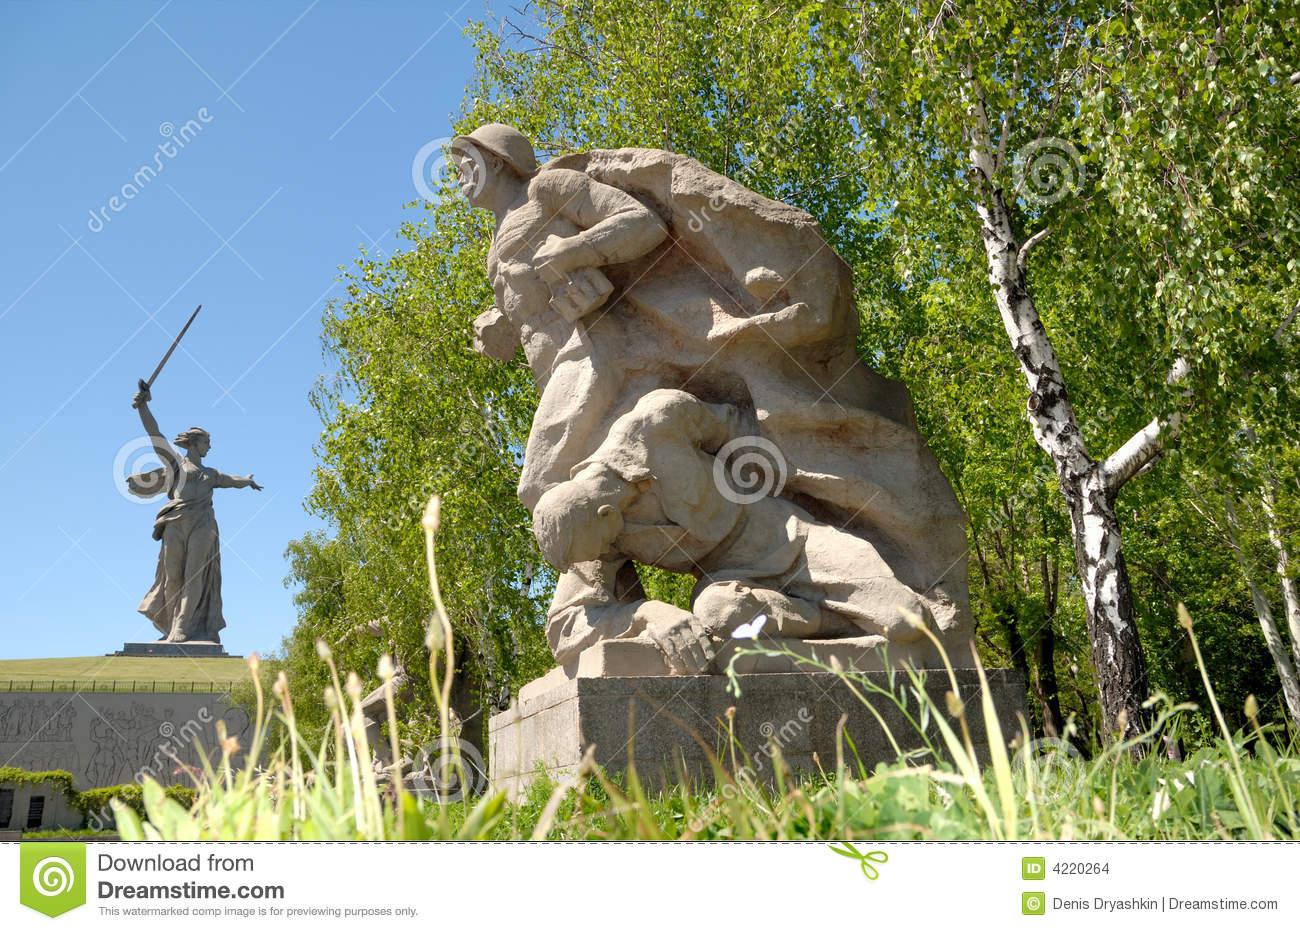 obelisk-memorável-da-segunda-guerra-mundial-em-mamayev-kurgan-4220264.jpg (1300×931)